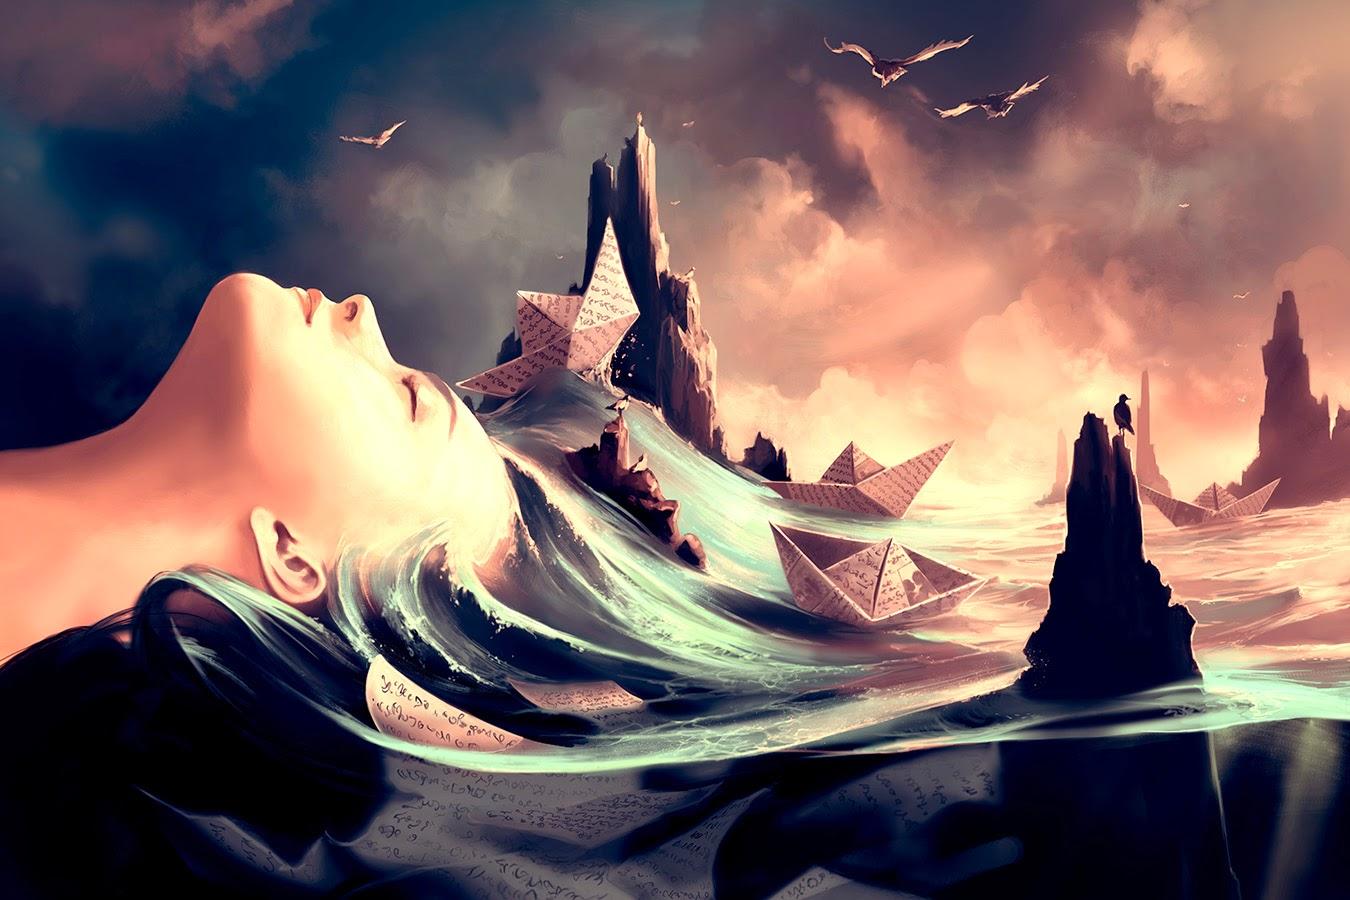 13-Katharsis-Rolando-Cyril-aquasixio-Surreal-Fantasy-Otherworldly-Art-www-designstack-co